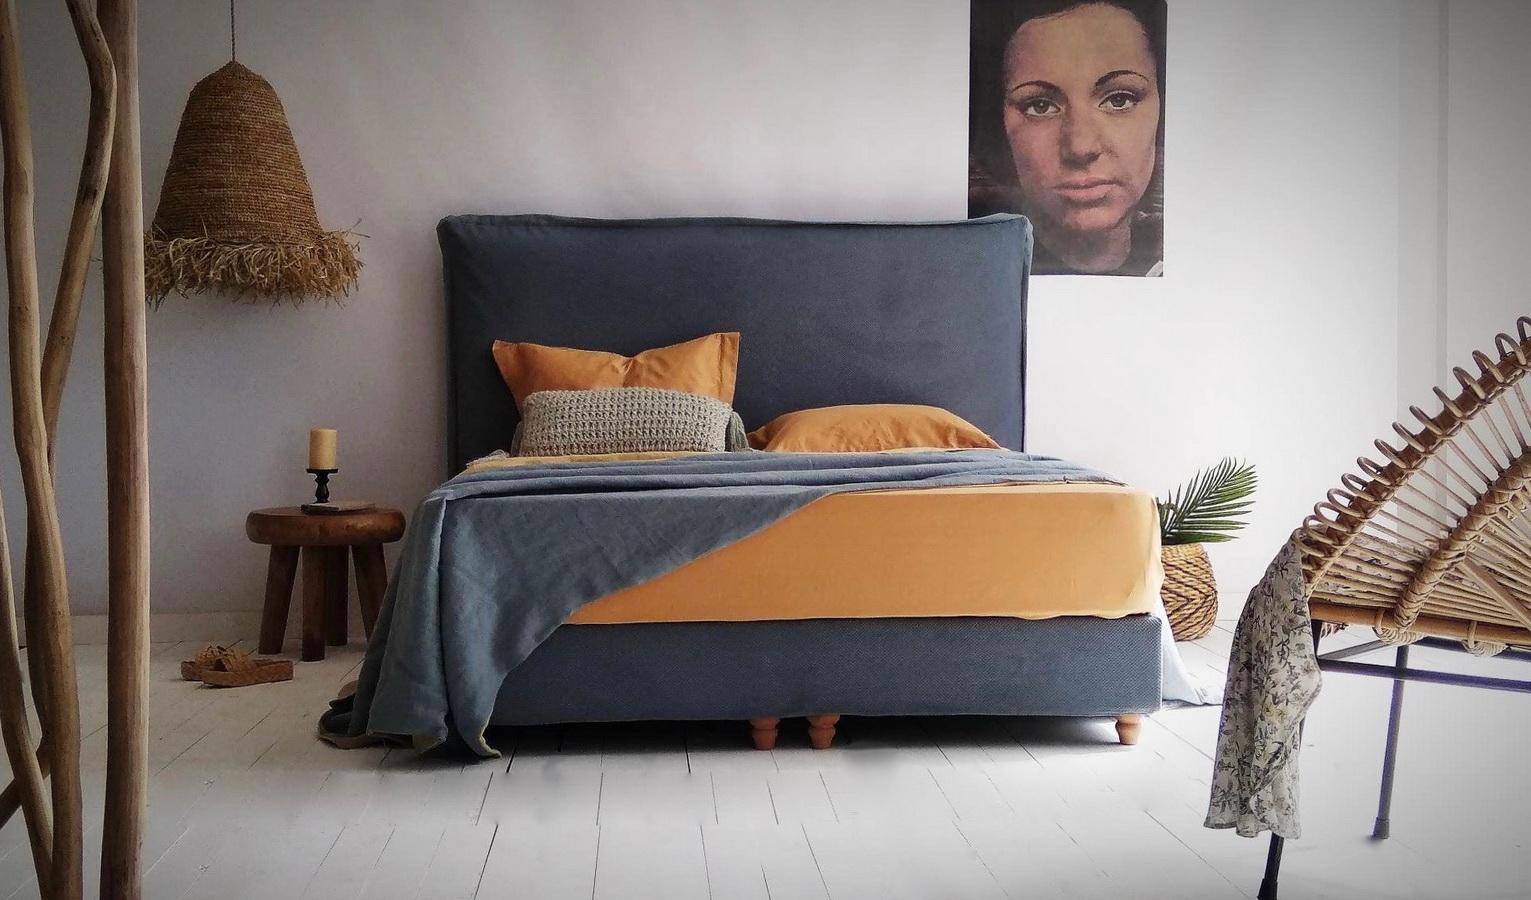 candia-campaing_nostalgia-bed-collection_hara-kontaxaki-02